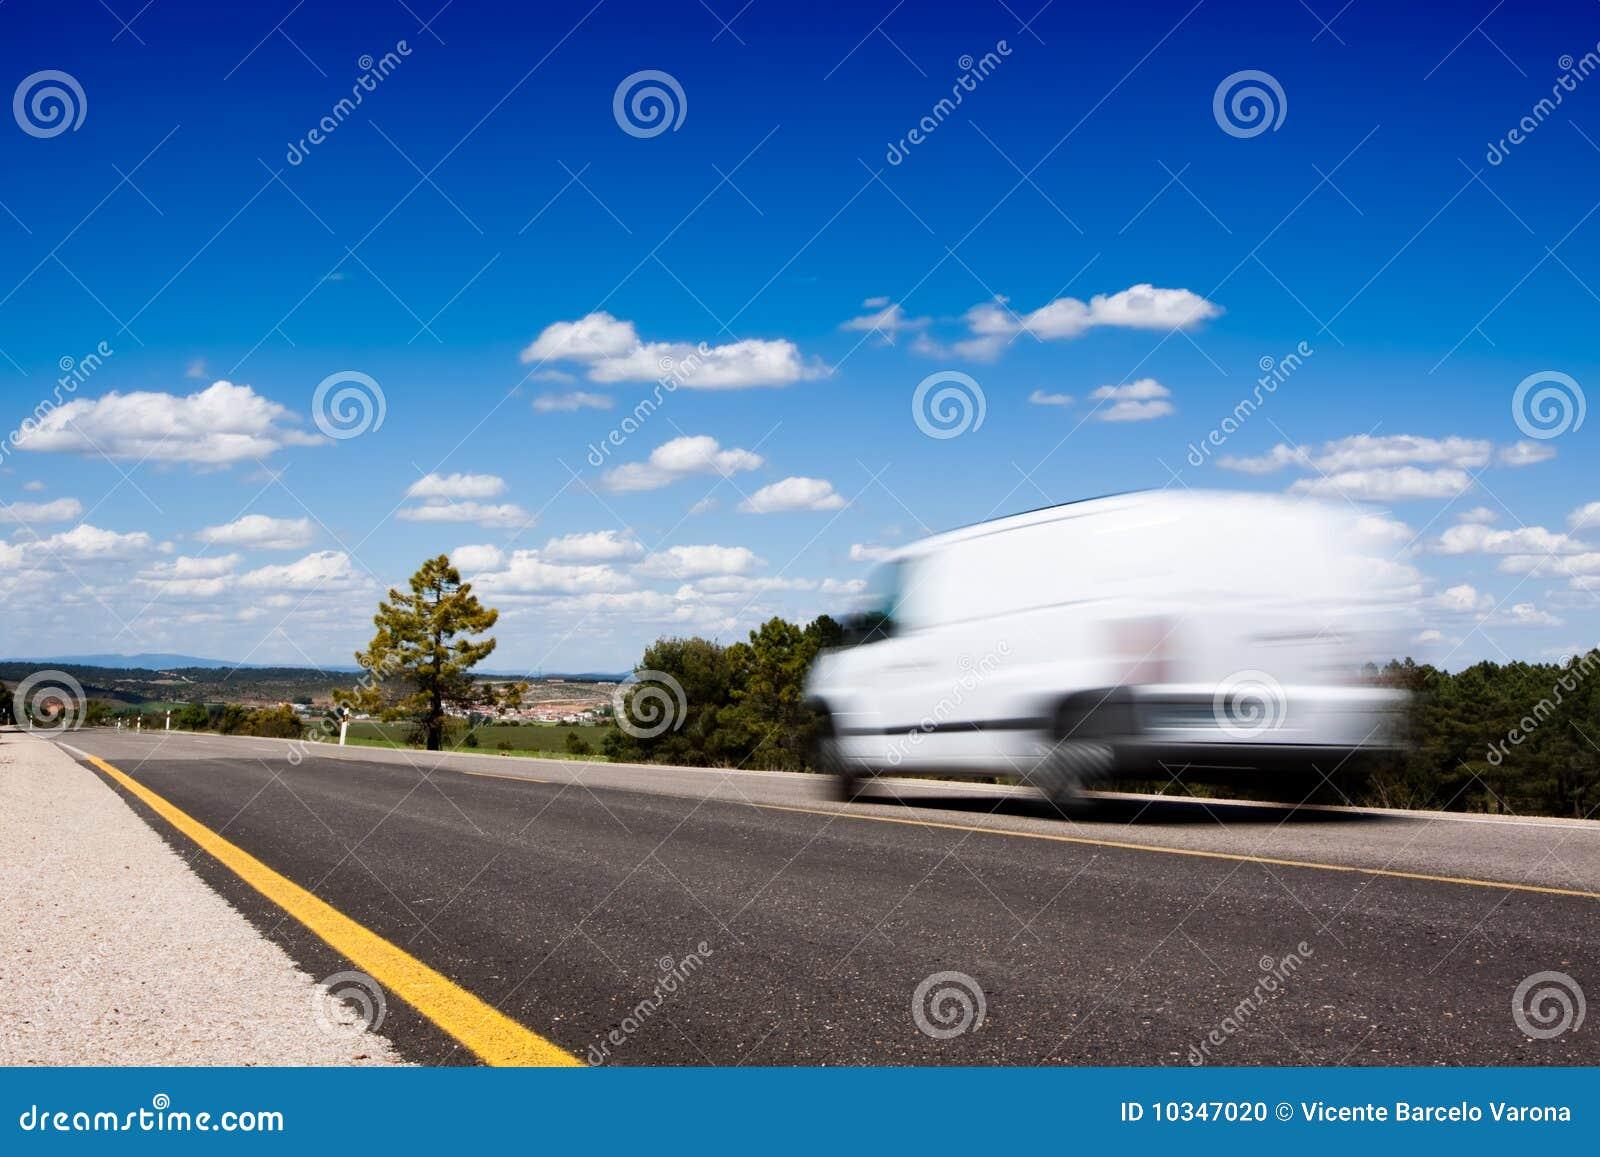 Van in the road